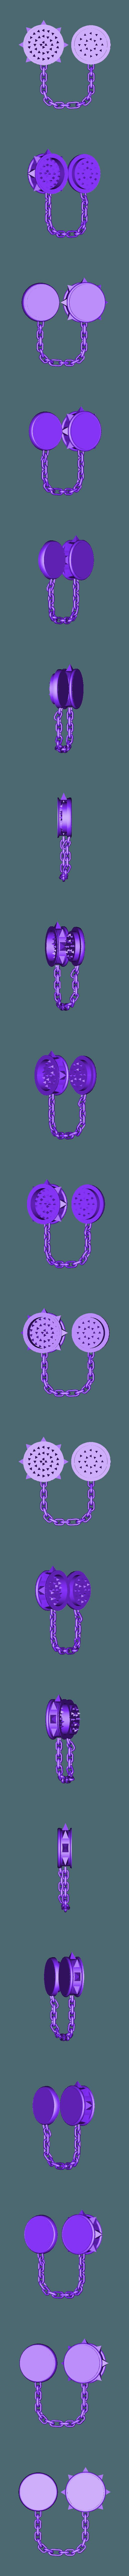 painfulgrinderinchains2017.STL Download free STL file grinder in chains      spices herbs weed hemp Gras dope • 3D print object, syzguru11